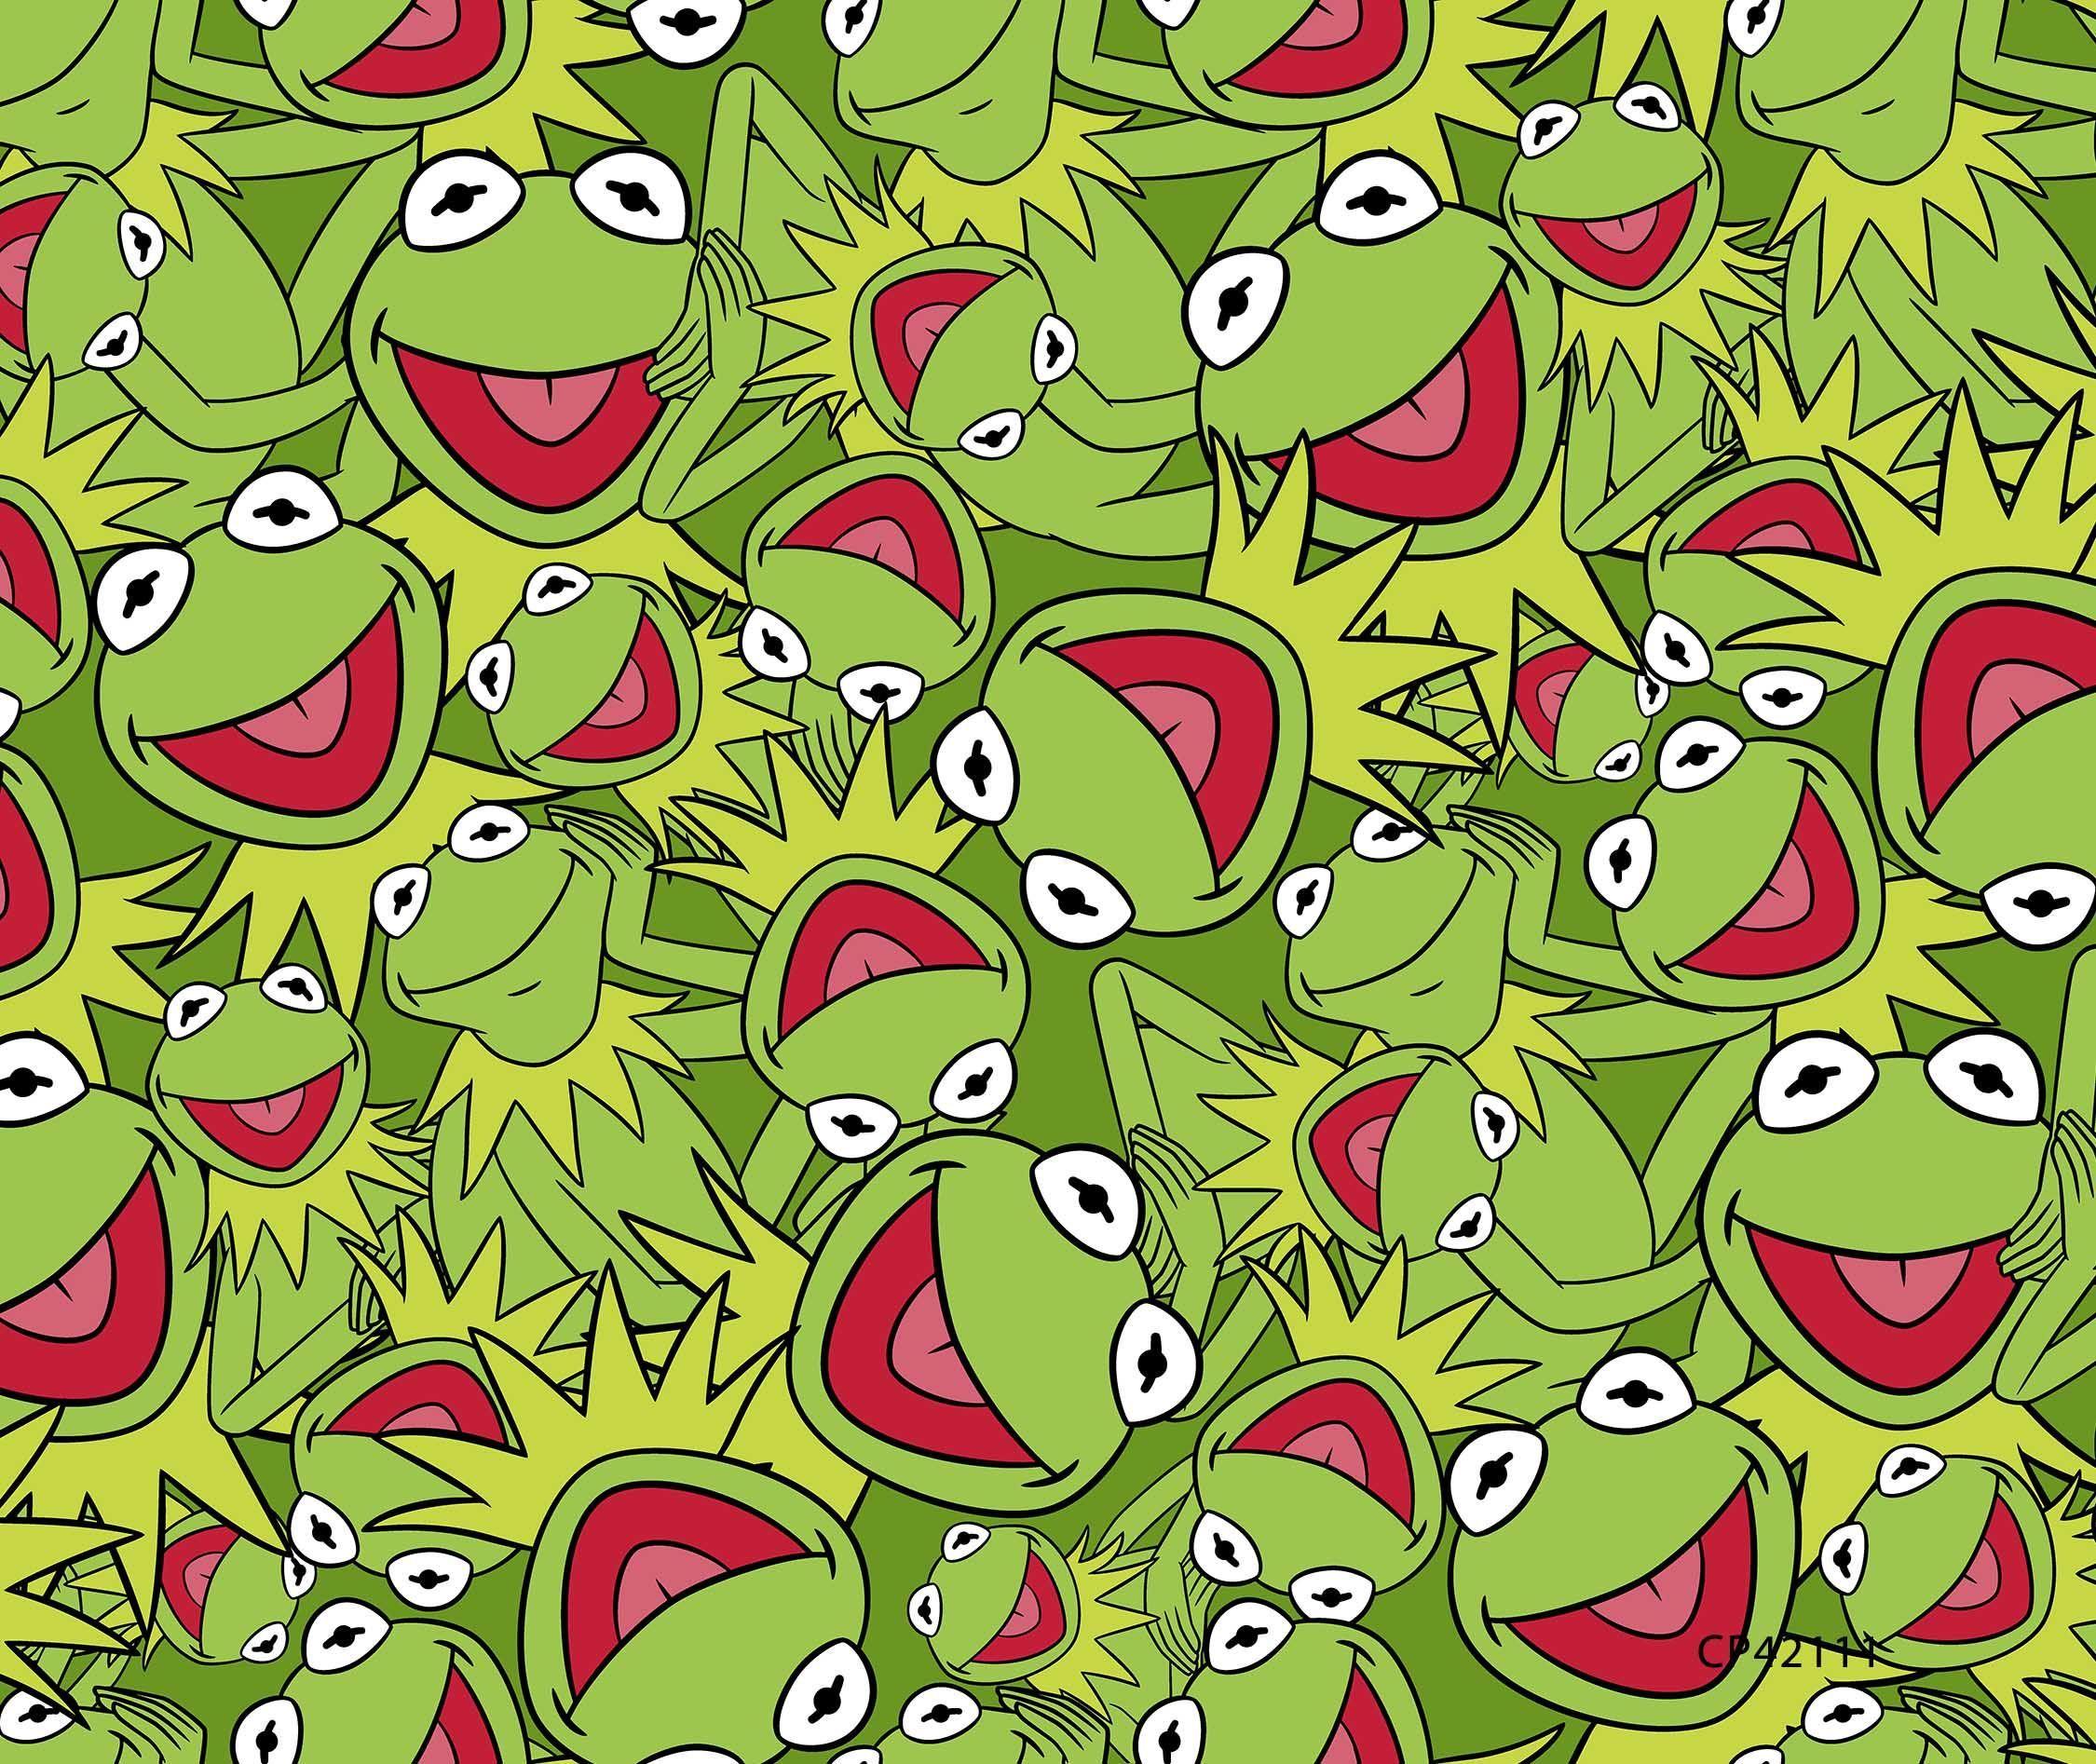 Muppets Kermit Packed 48 No Sew Fleece Throw Ranas